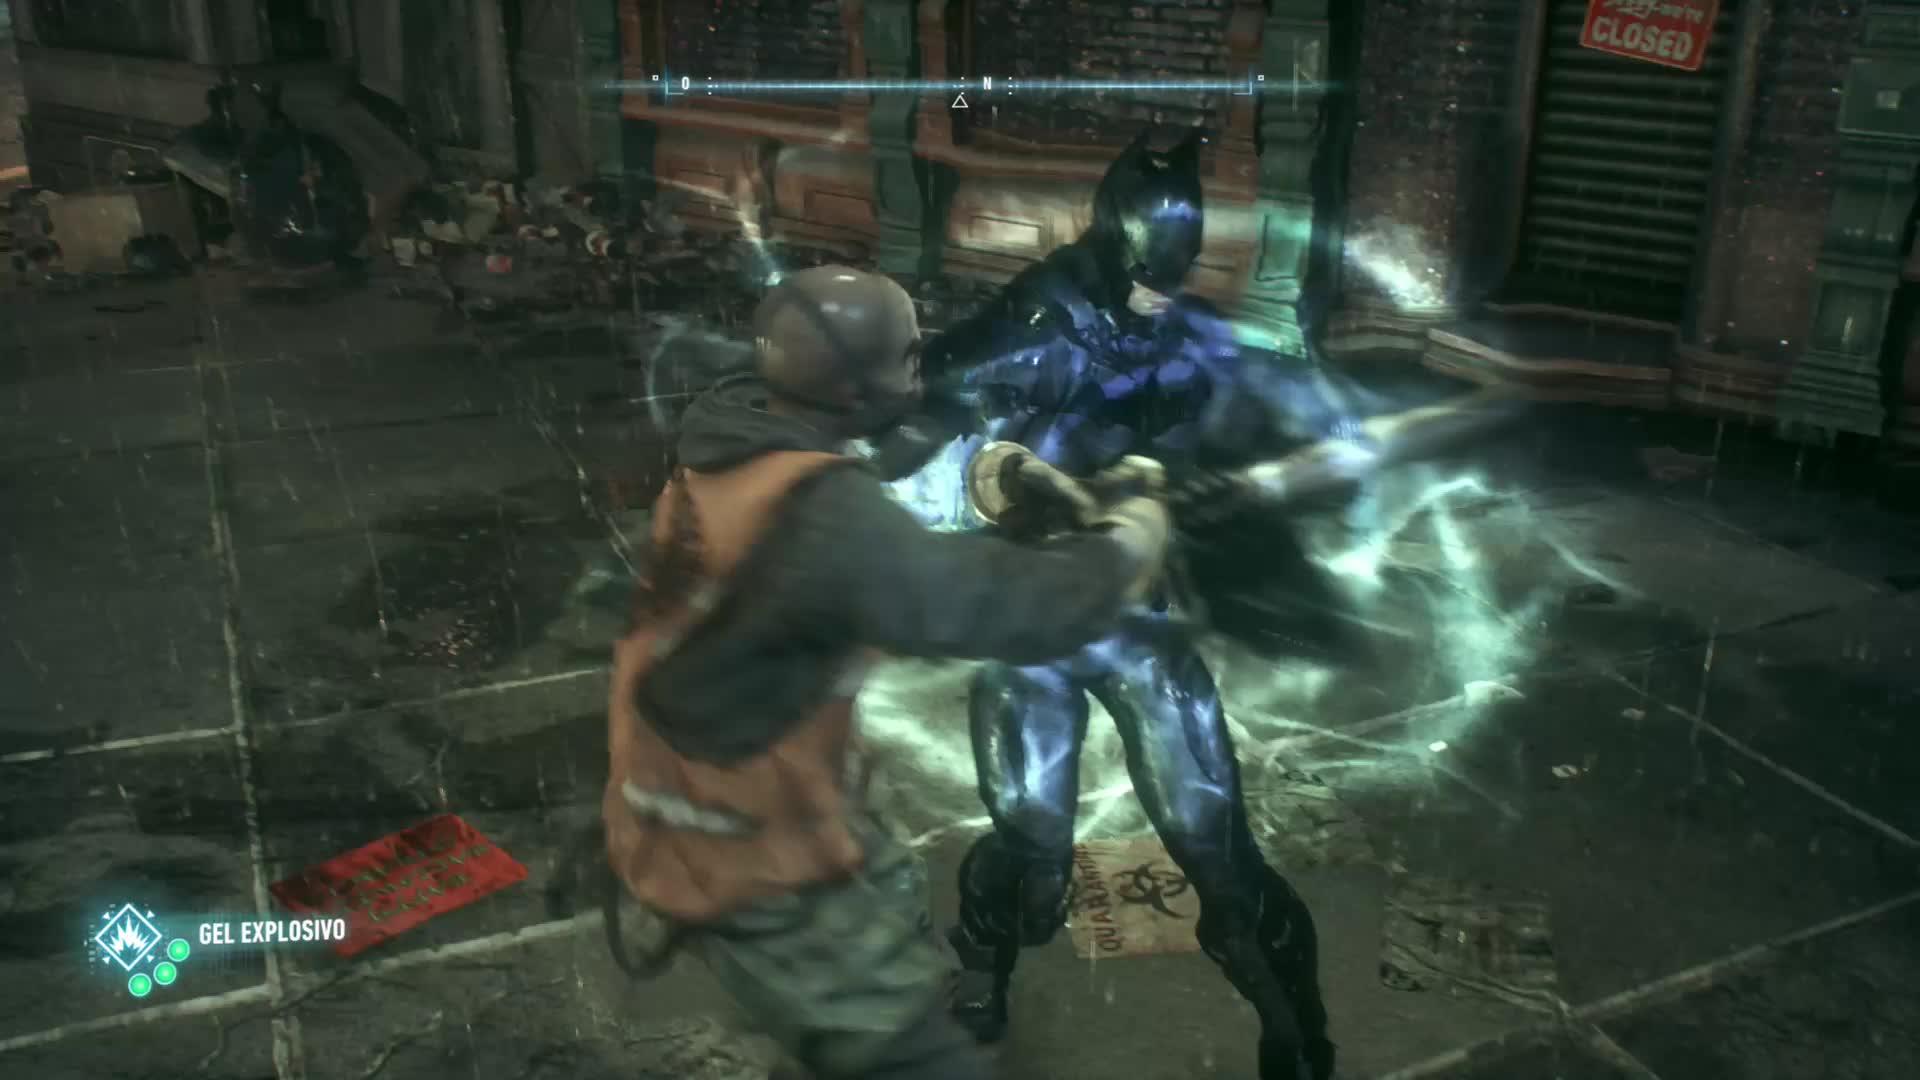 BatmanArkhamKnight, Kododo, gamer dvr, xbox, xbox one,  GIFs